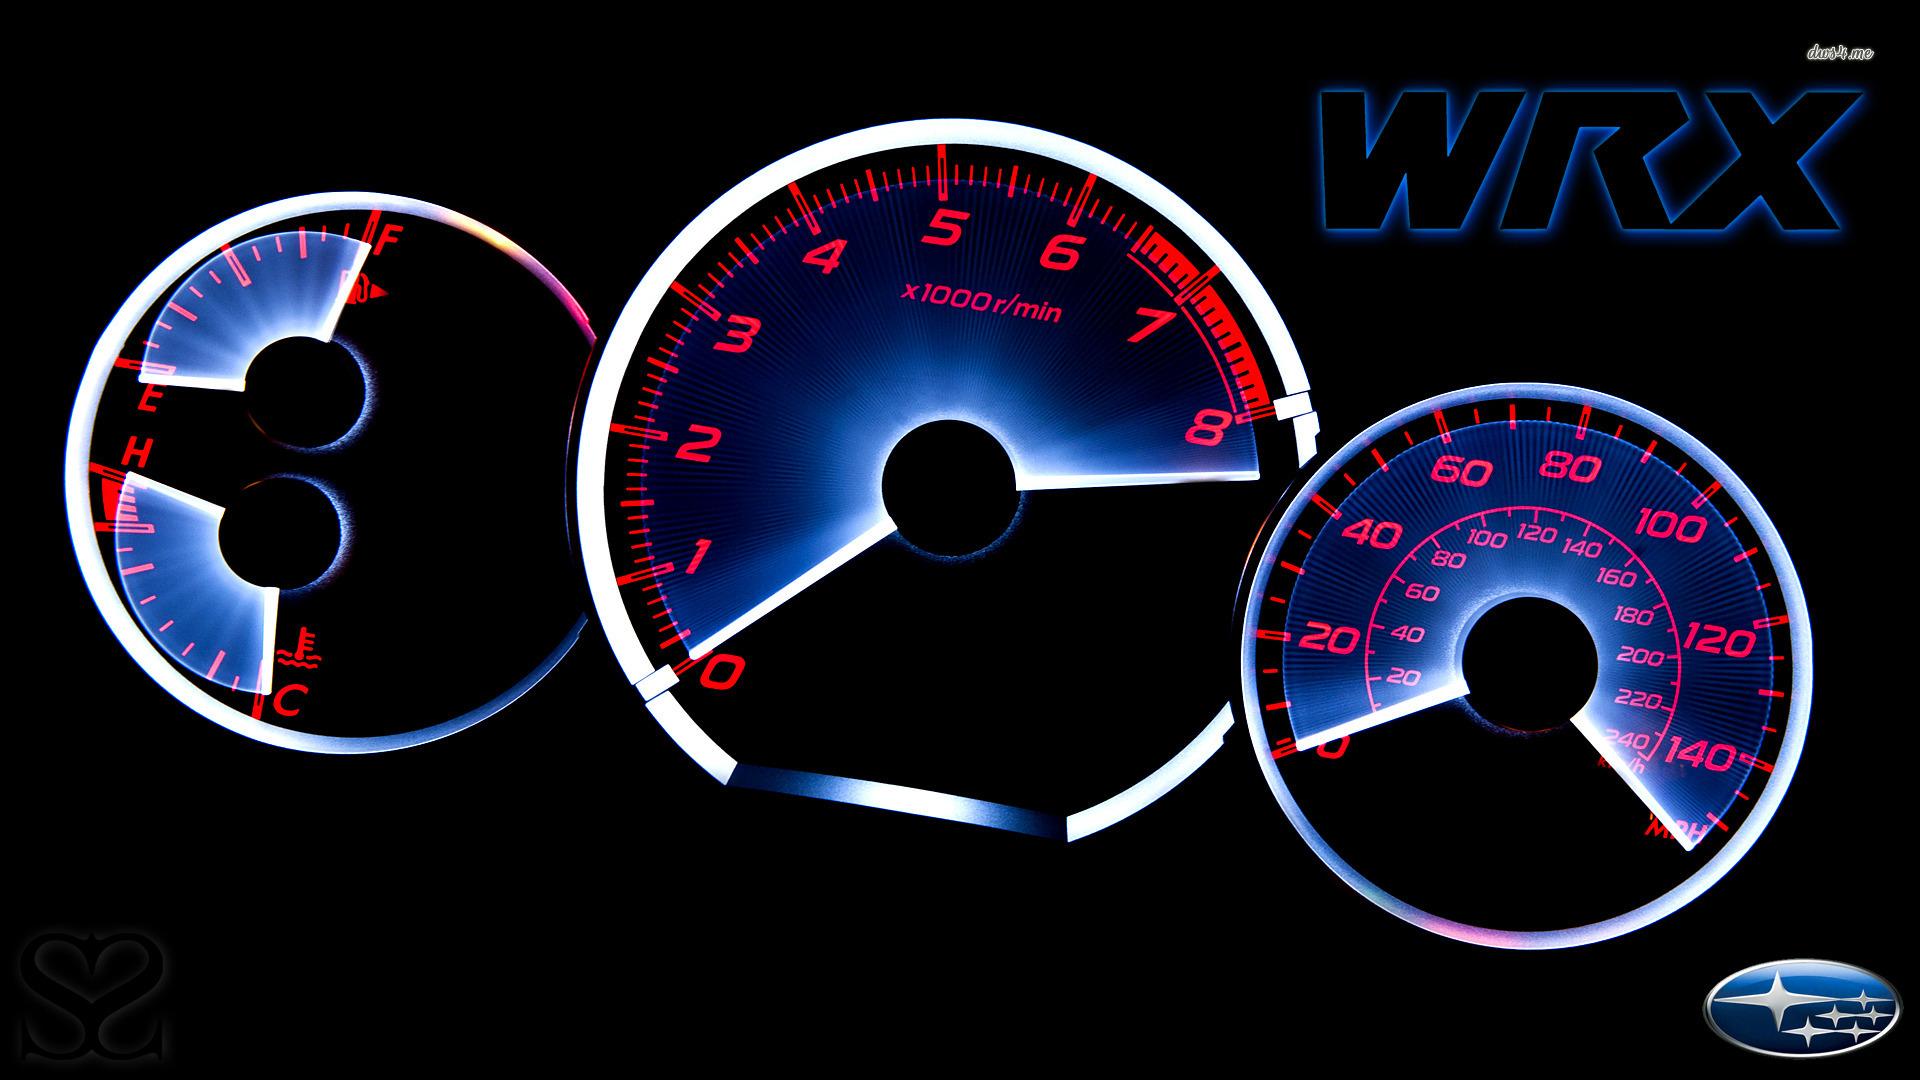 Subaru Impreza WRX gauges wallpaper 1280x800 Subaru Impreza WRX gauges 1920x1080